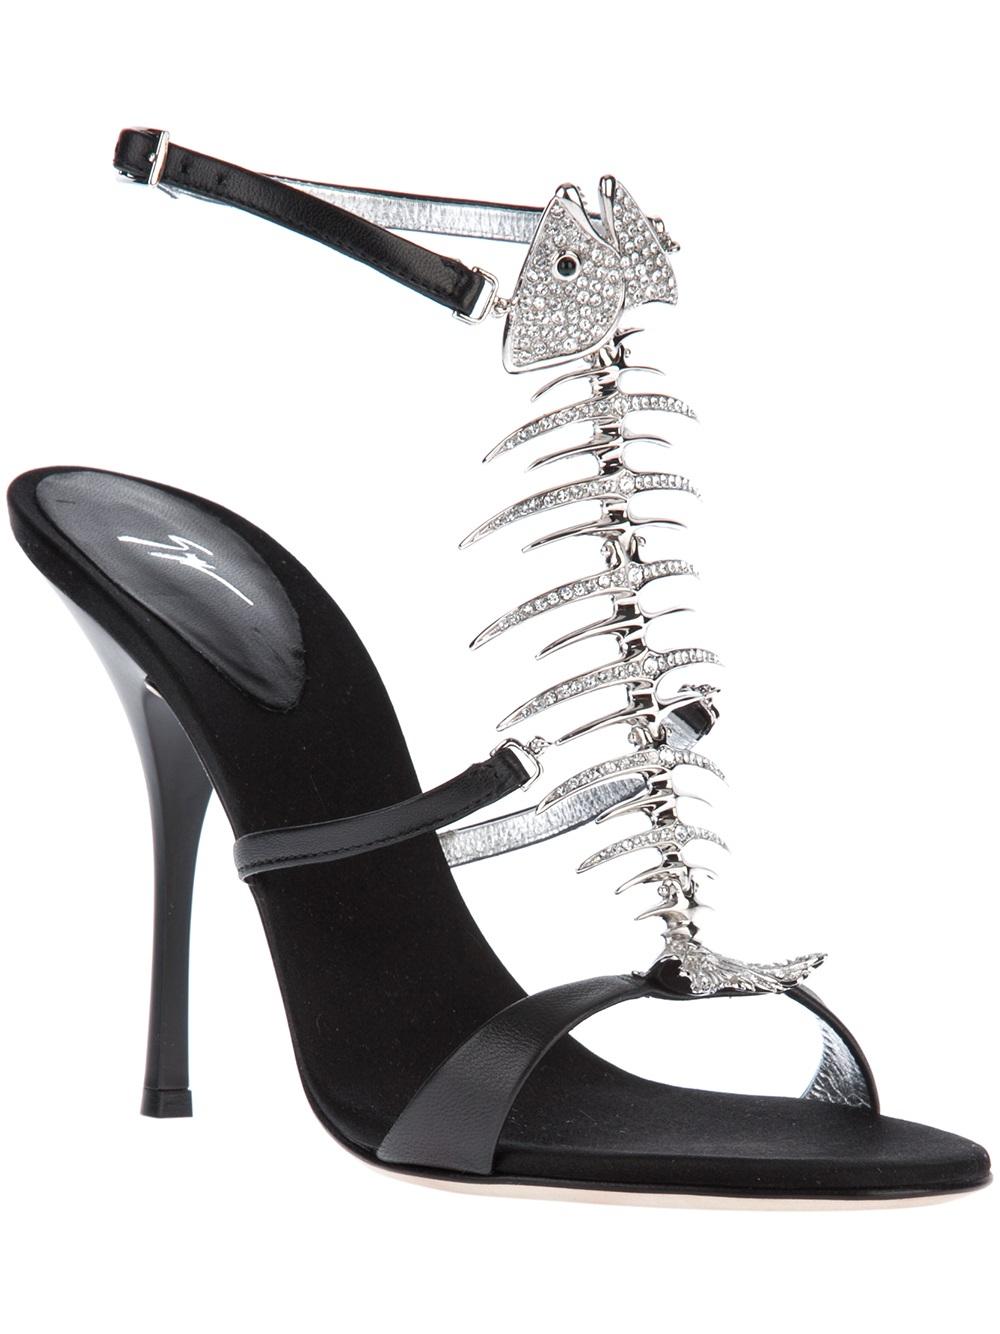 giuseppe-zanotti-design-black-fish-bone-sandal-product-1-17196212-0-199700160-normal